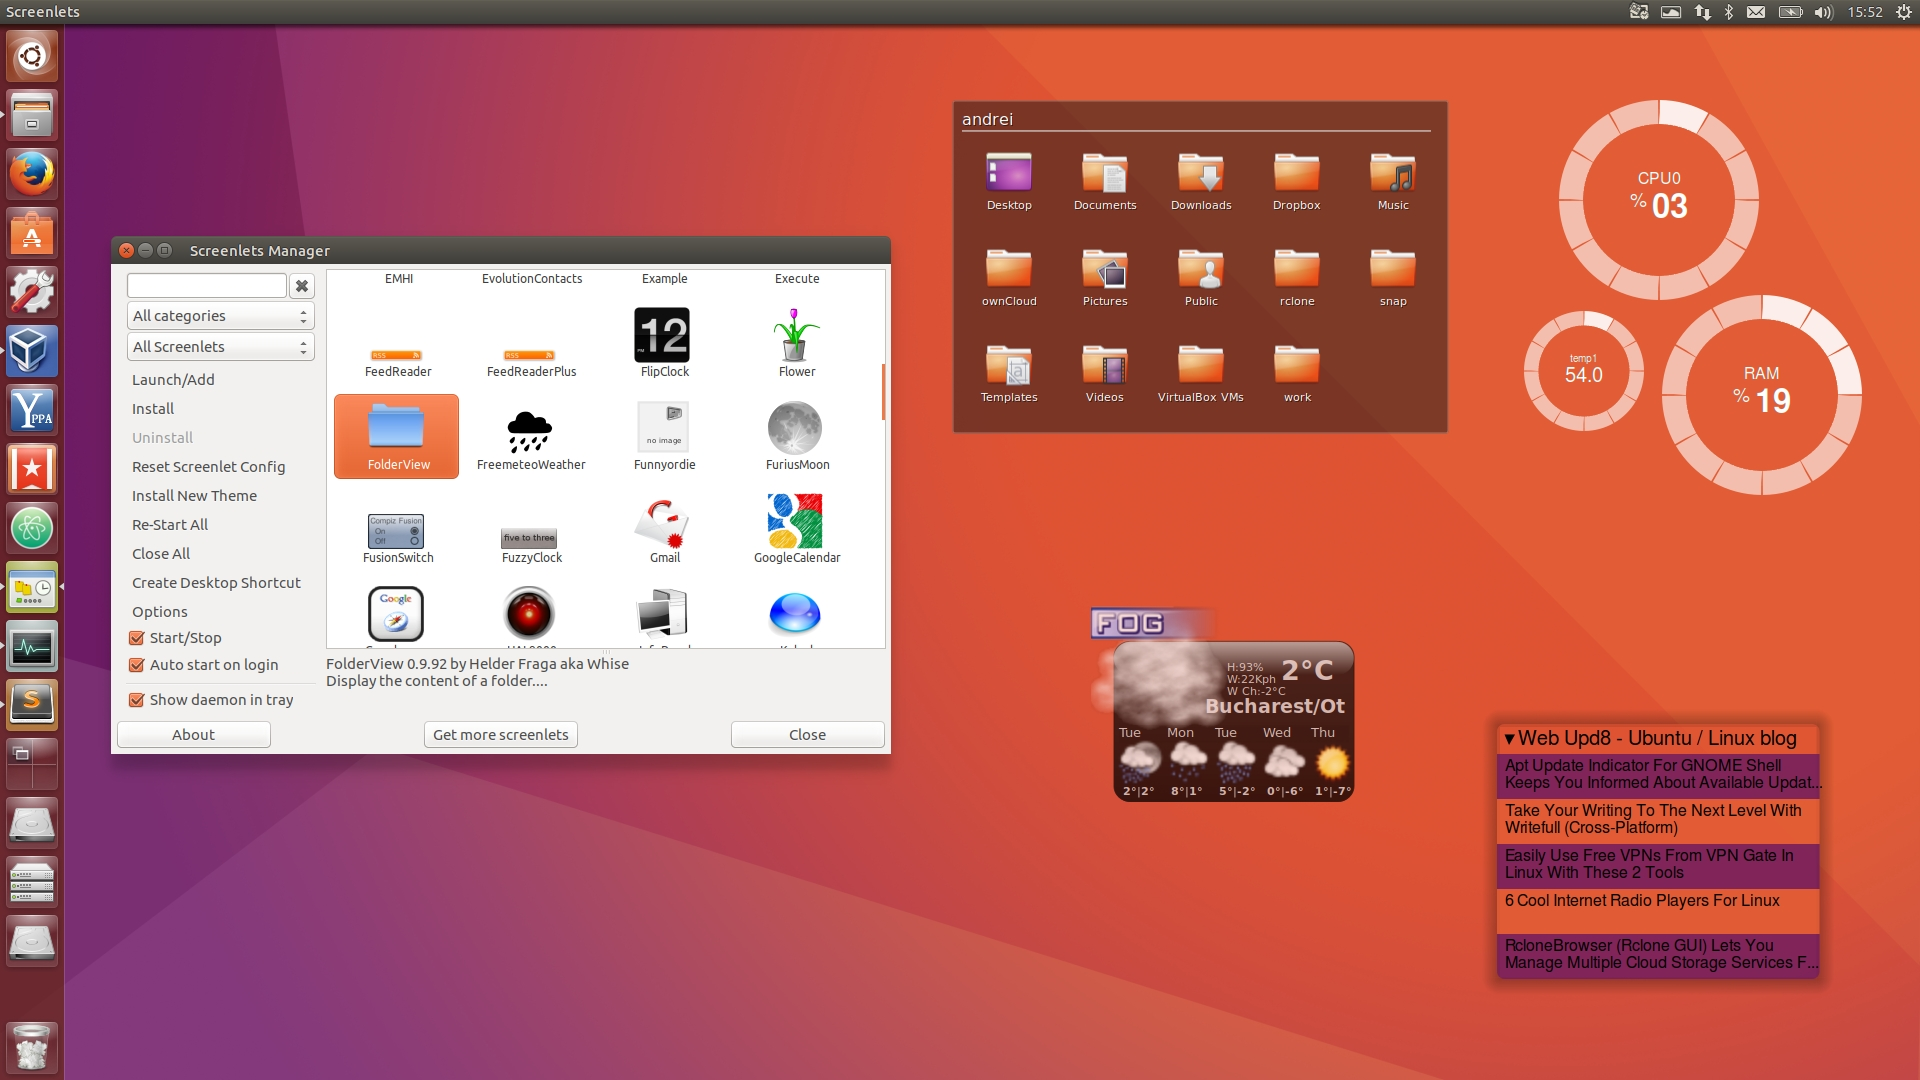 Screenlets (Desktop Widgets) Fixed For Ubuntu 16.04, Available In_Calendar Countdown In Desktop